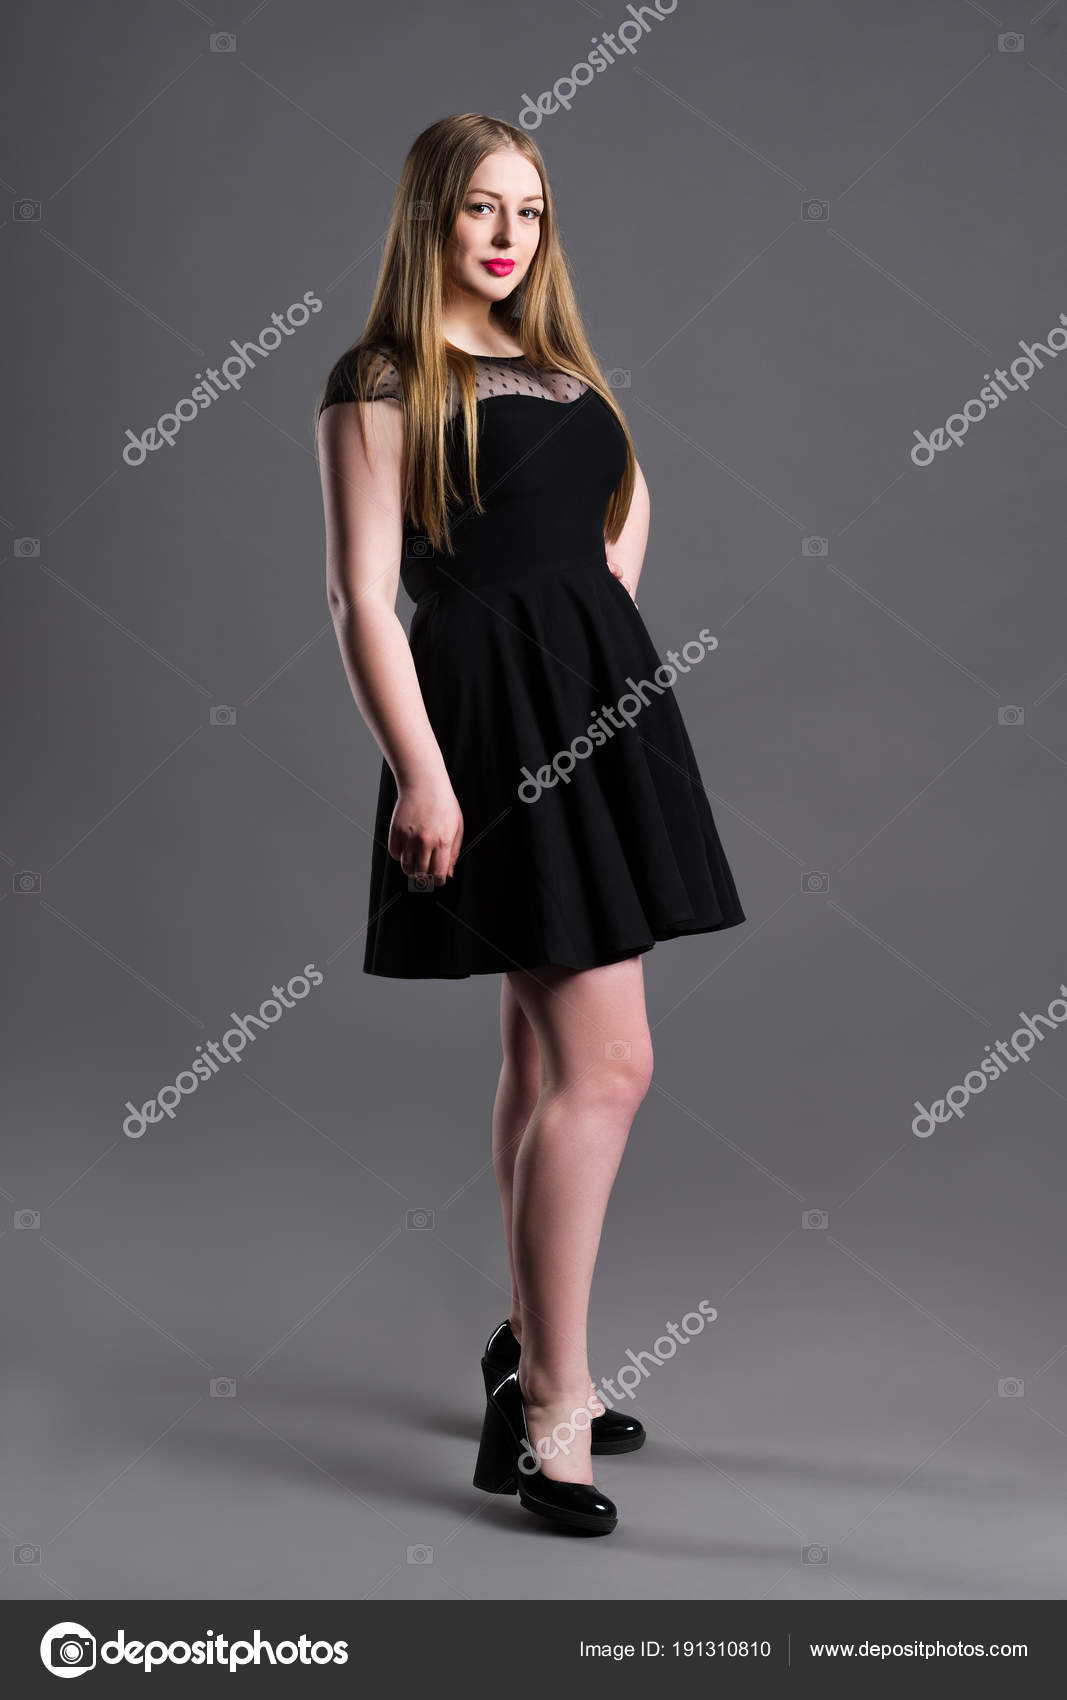 Plus Size Mode-Modell im schwarzen Kleid, Fette Frau auf graue ...